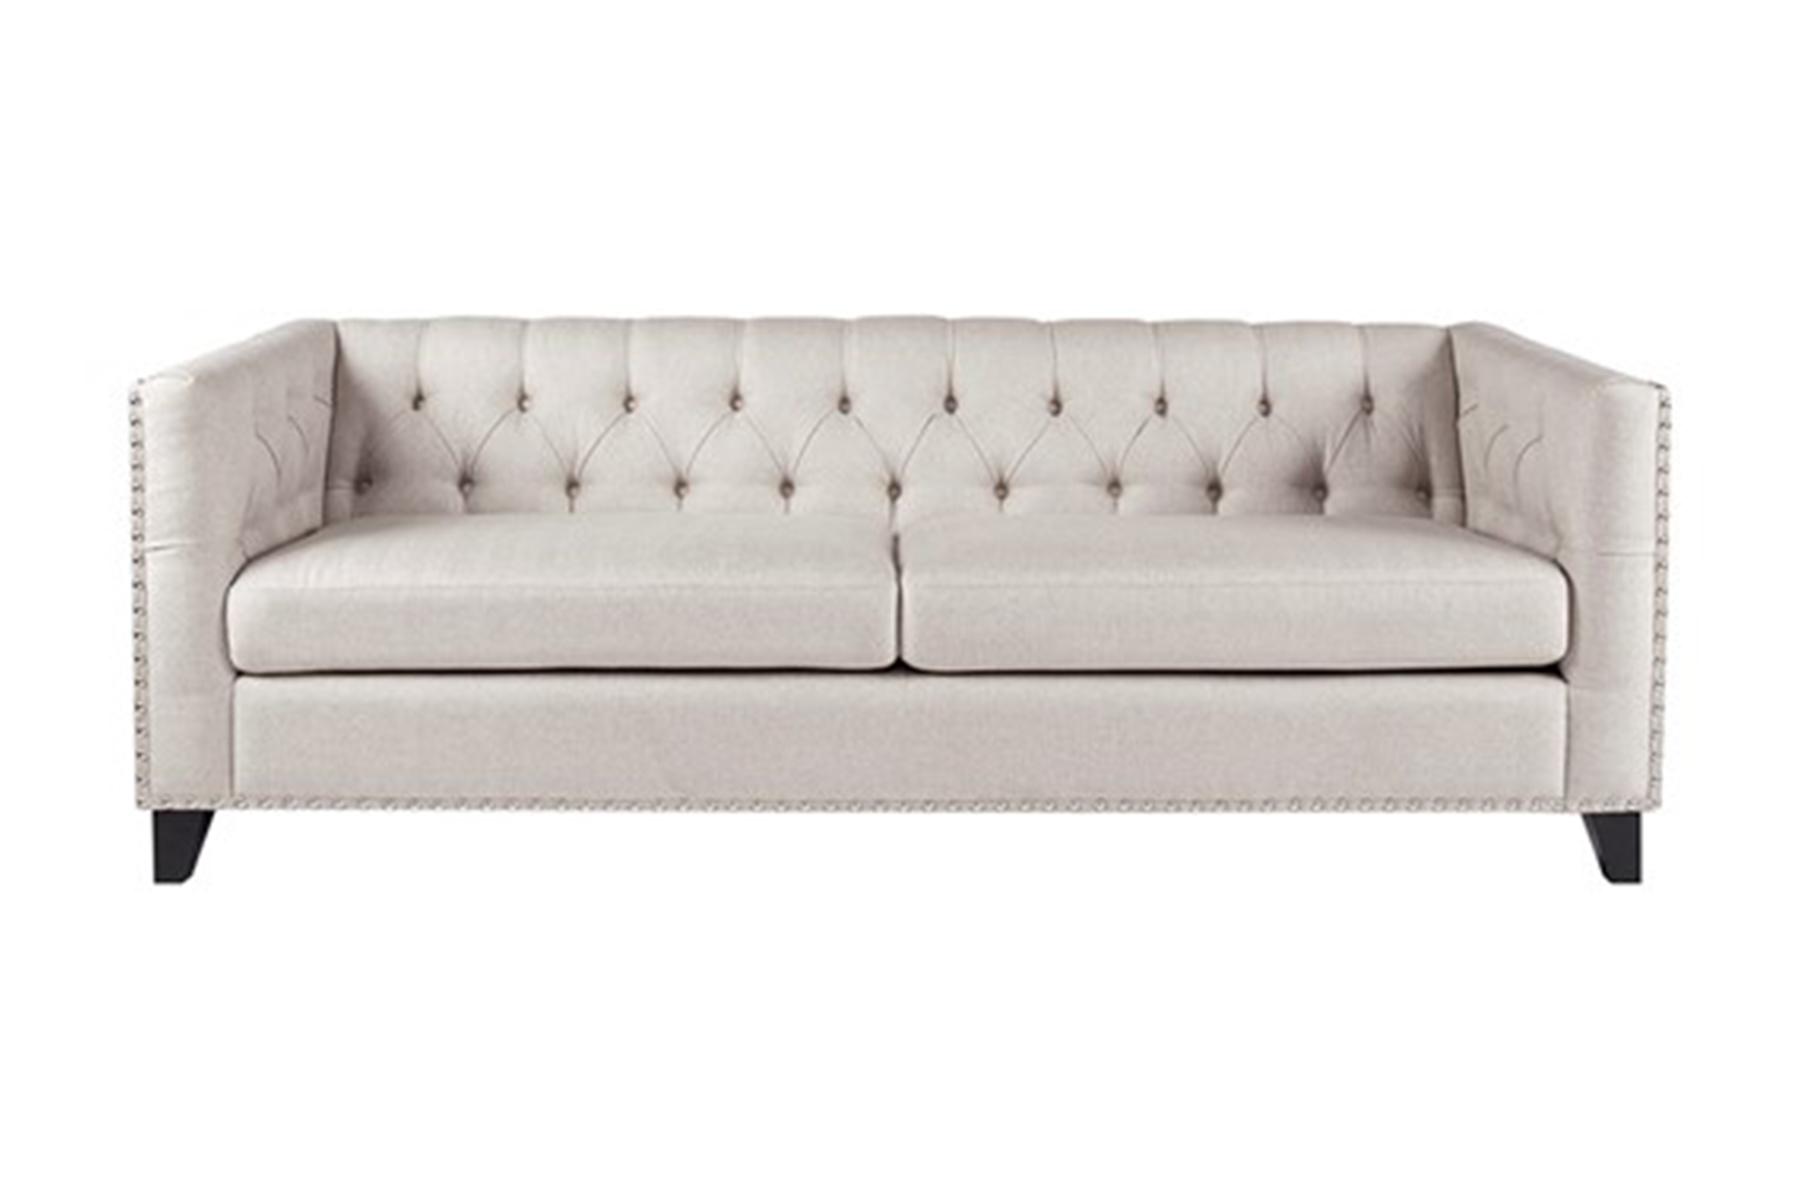 Hemingway Sofa